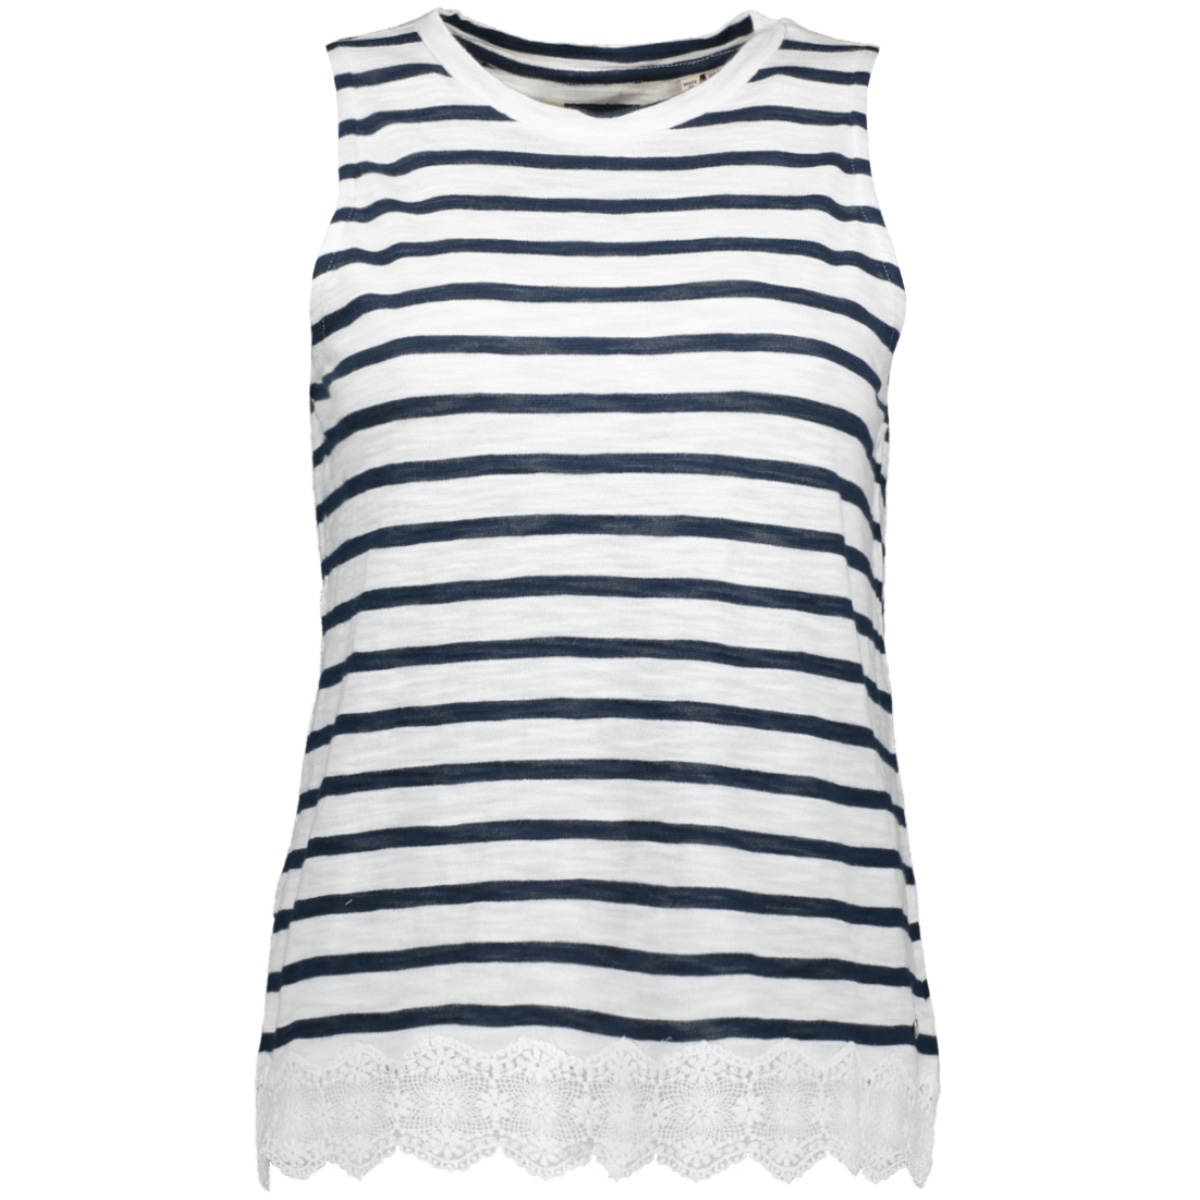 lace mix vest w6010170a superdry top navy stripe